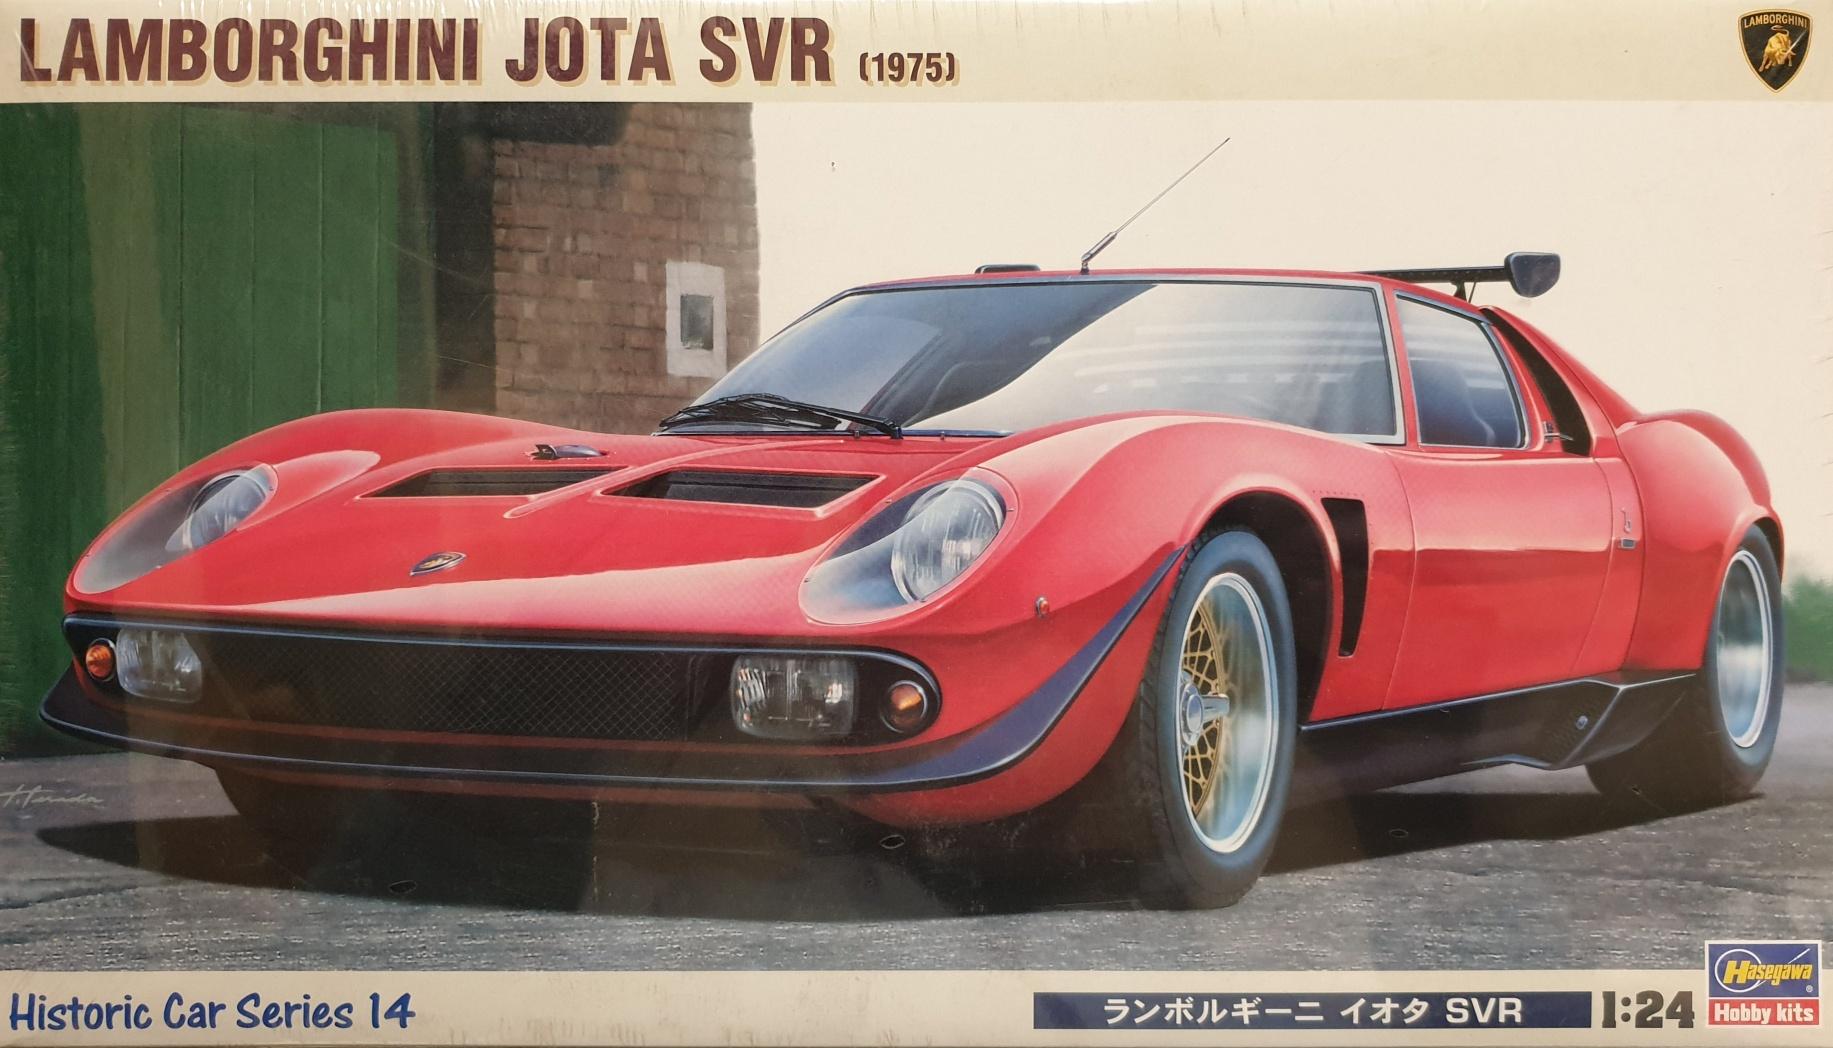 Hasegawa 21214 Lamborghini Jota SVR (1975)